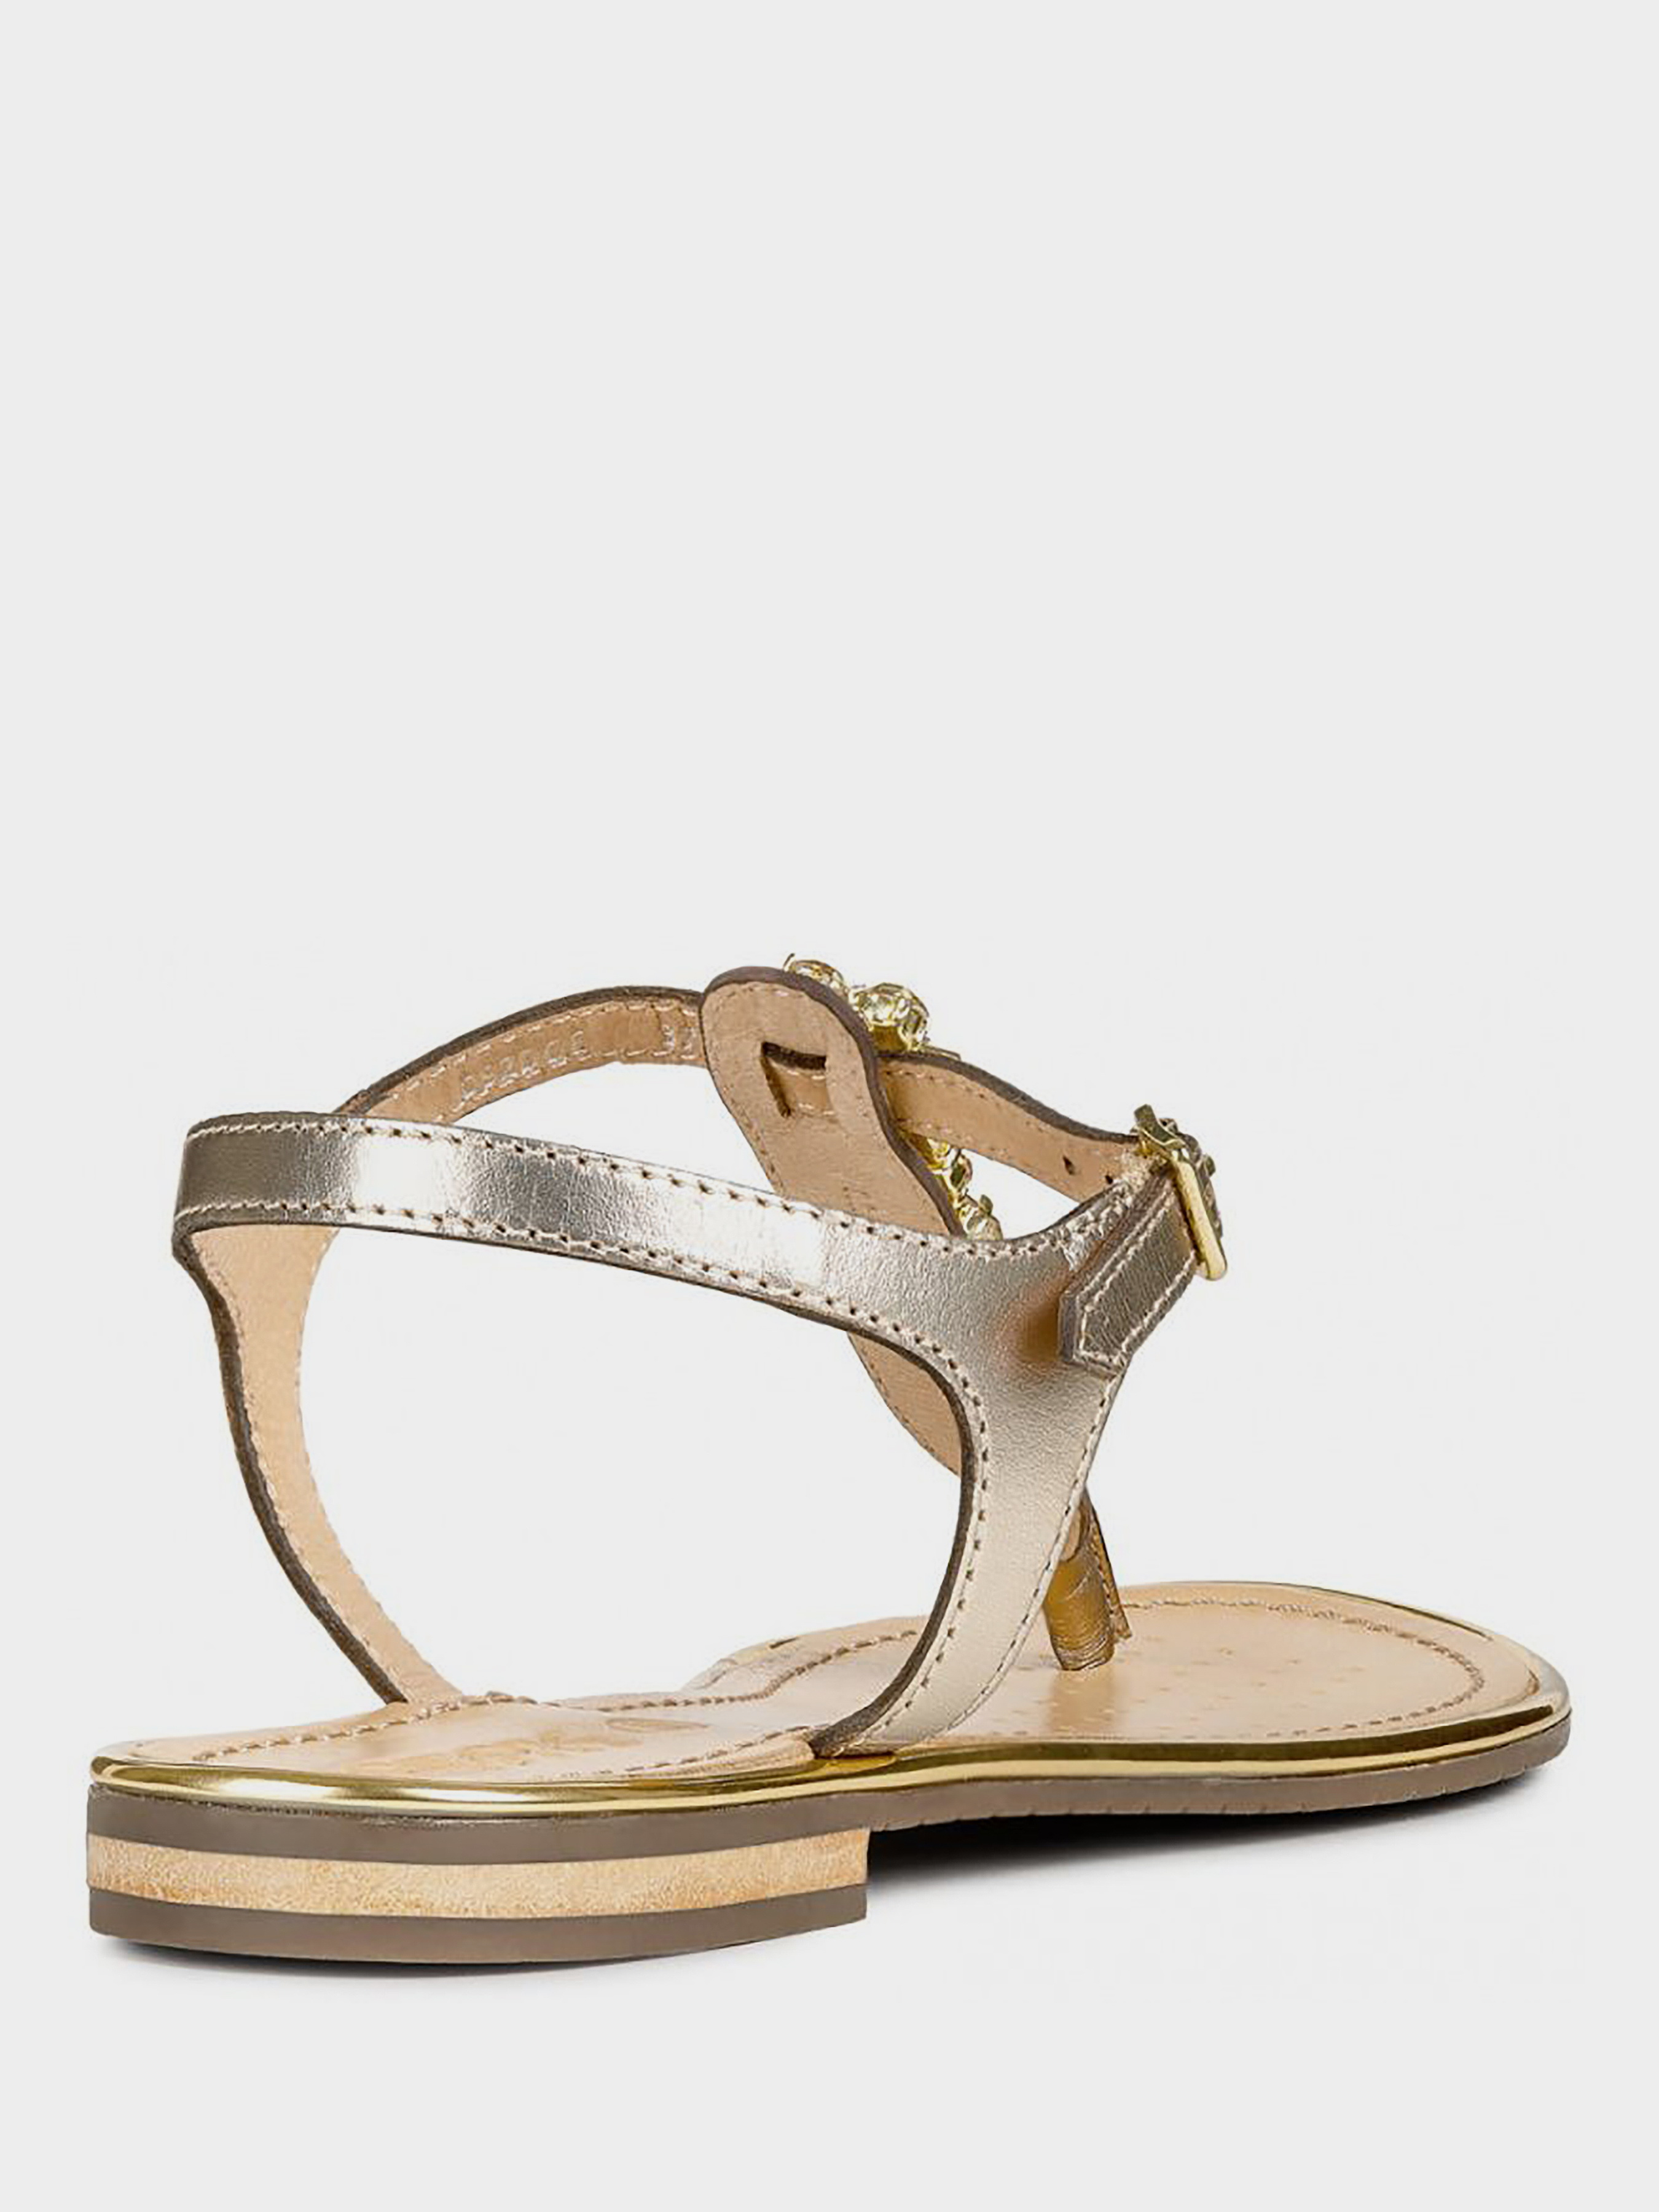 Сандалии женские Geox D SOZY PLUS XW3592 купить обувь, 2017